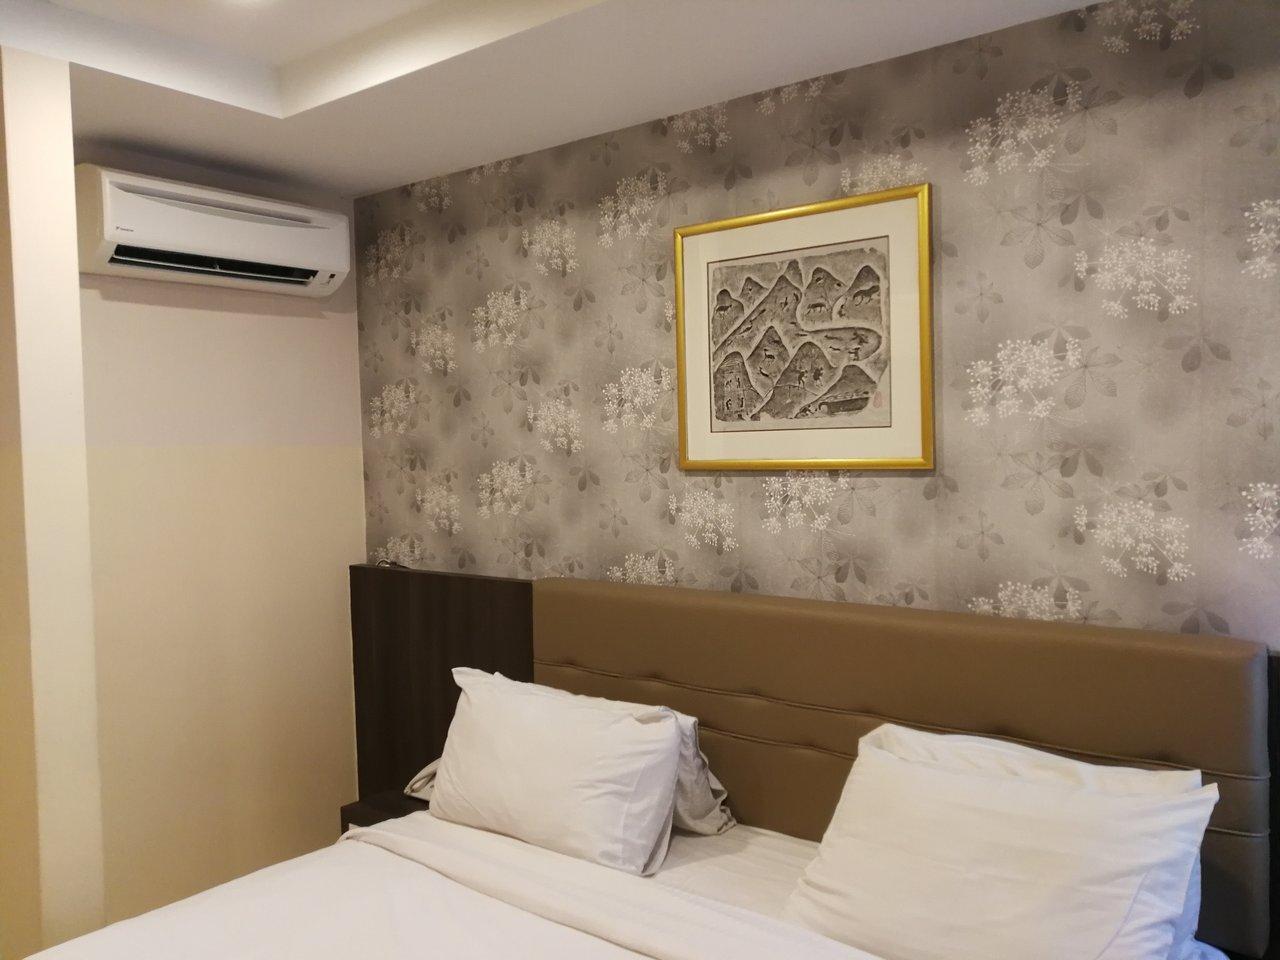 louis hotel r m 1 2 7 rm 86 updated 2018 reviews price rh tripadvisor com my